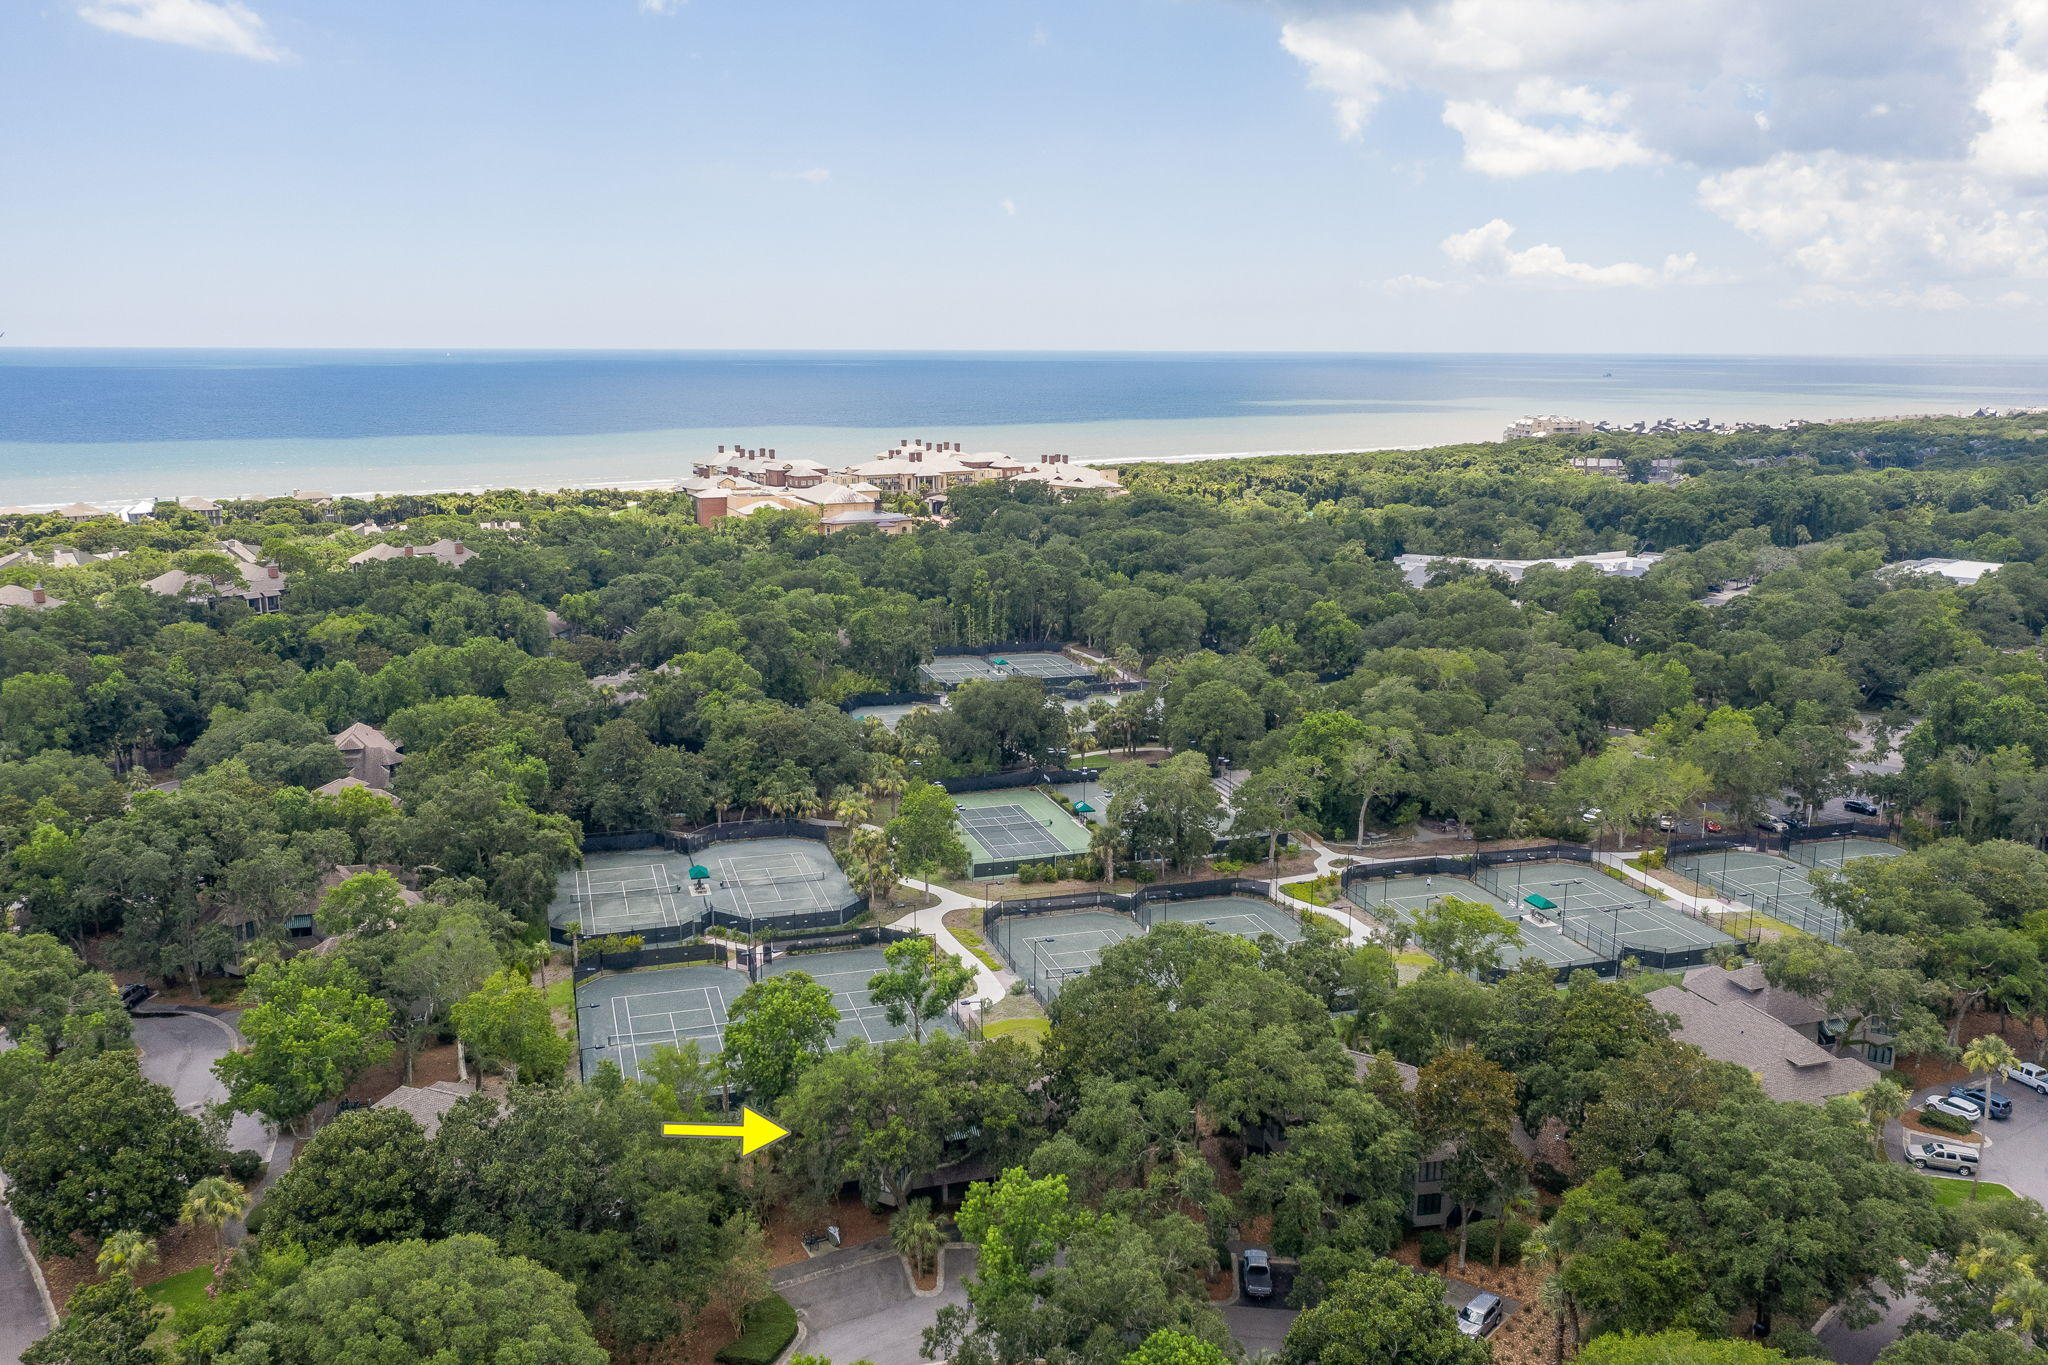 Kiawah Island Condos For Sale - 4717 Tennis Club, Kiawah Island, SC - 18